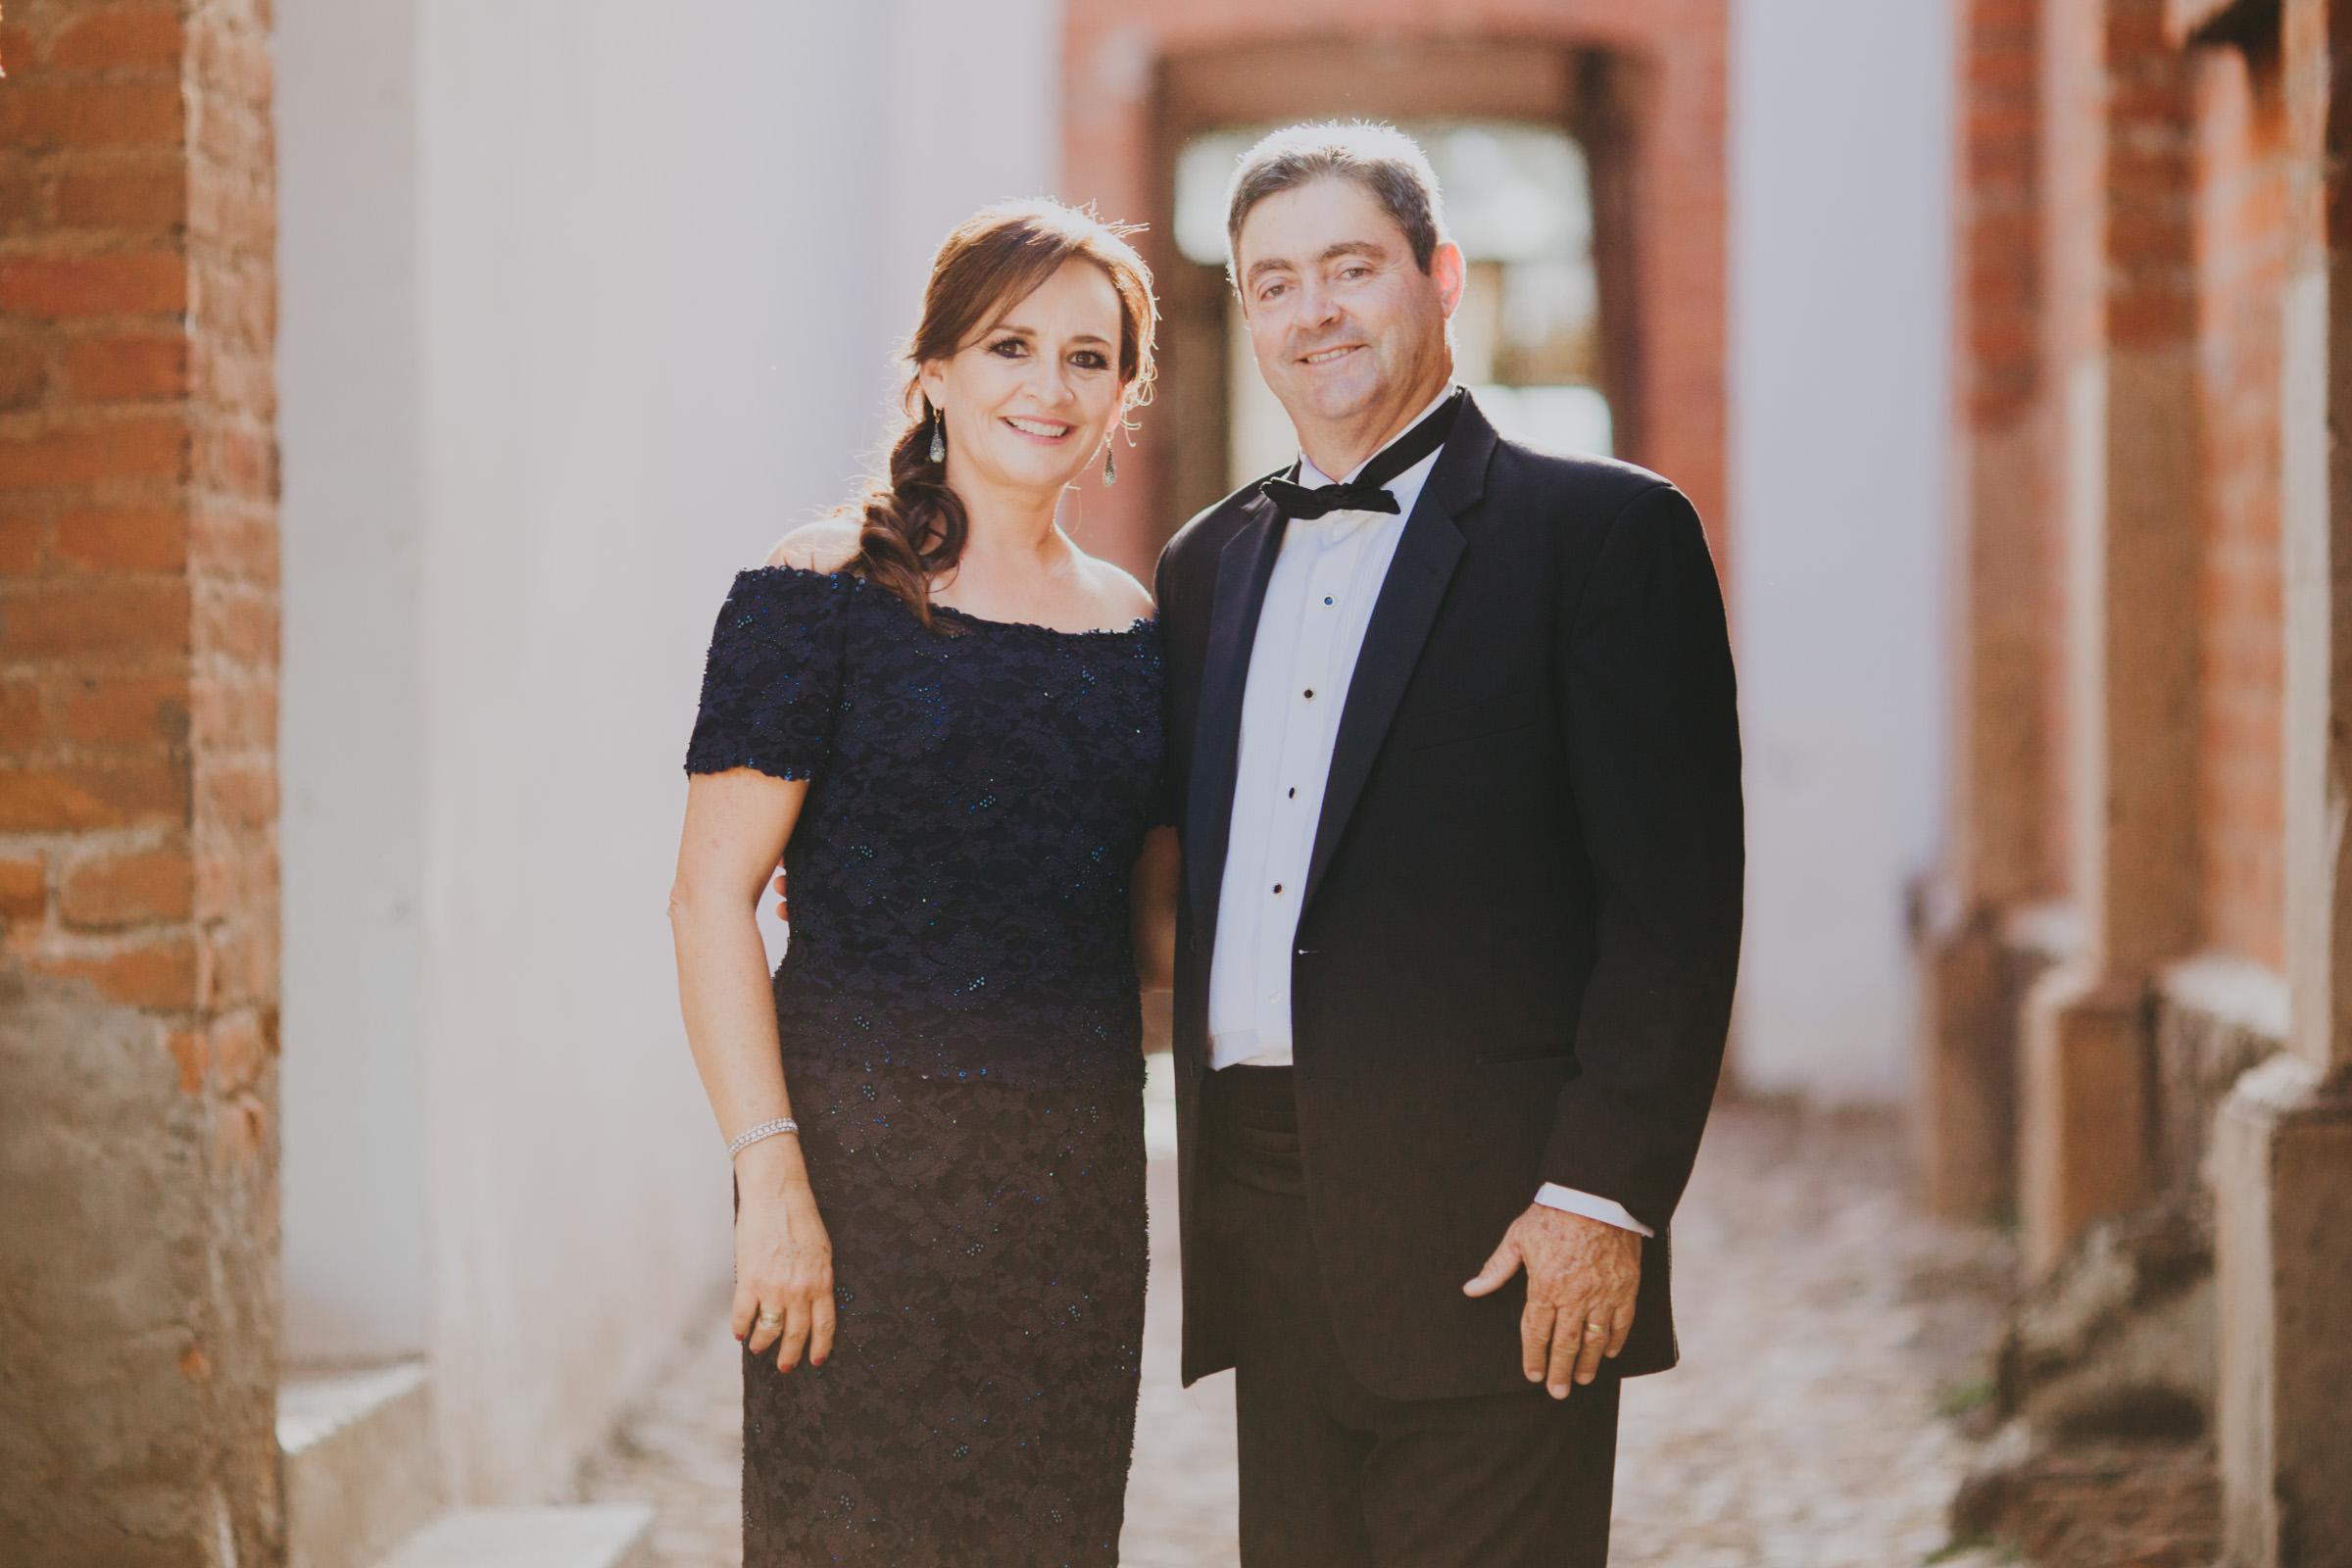 irapuato-boda-fotografia-jardines-alcalde-guanajuato-paulina-juan-pedro--76.jpg